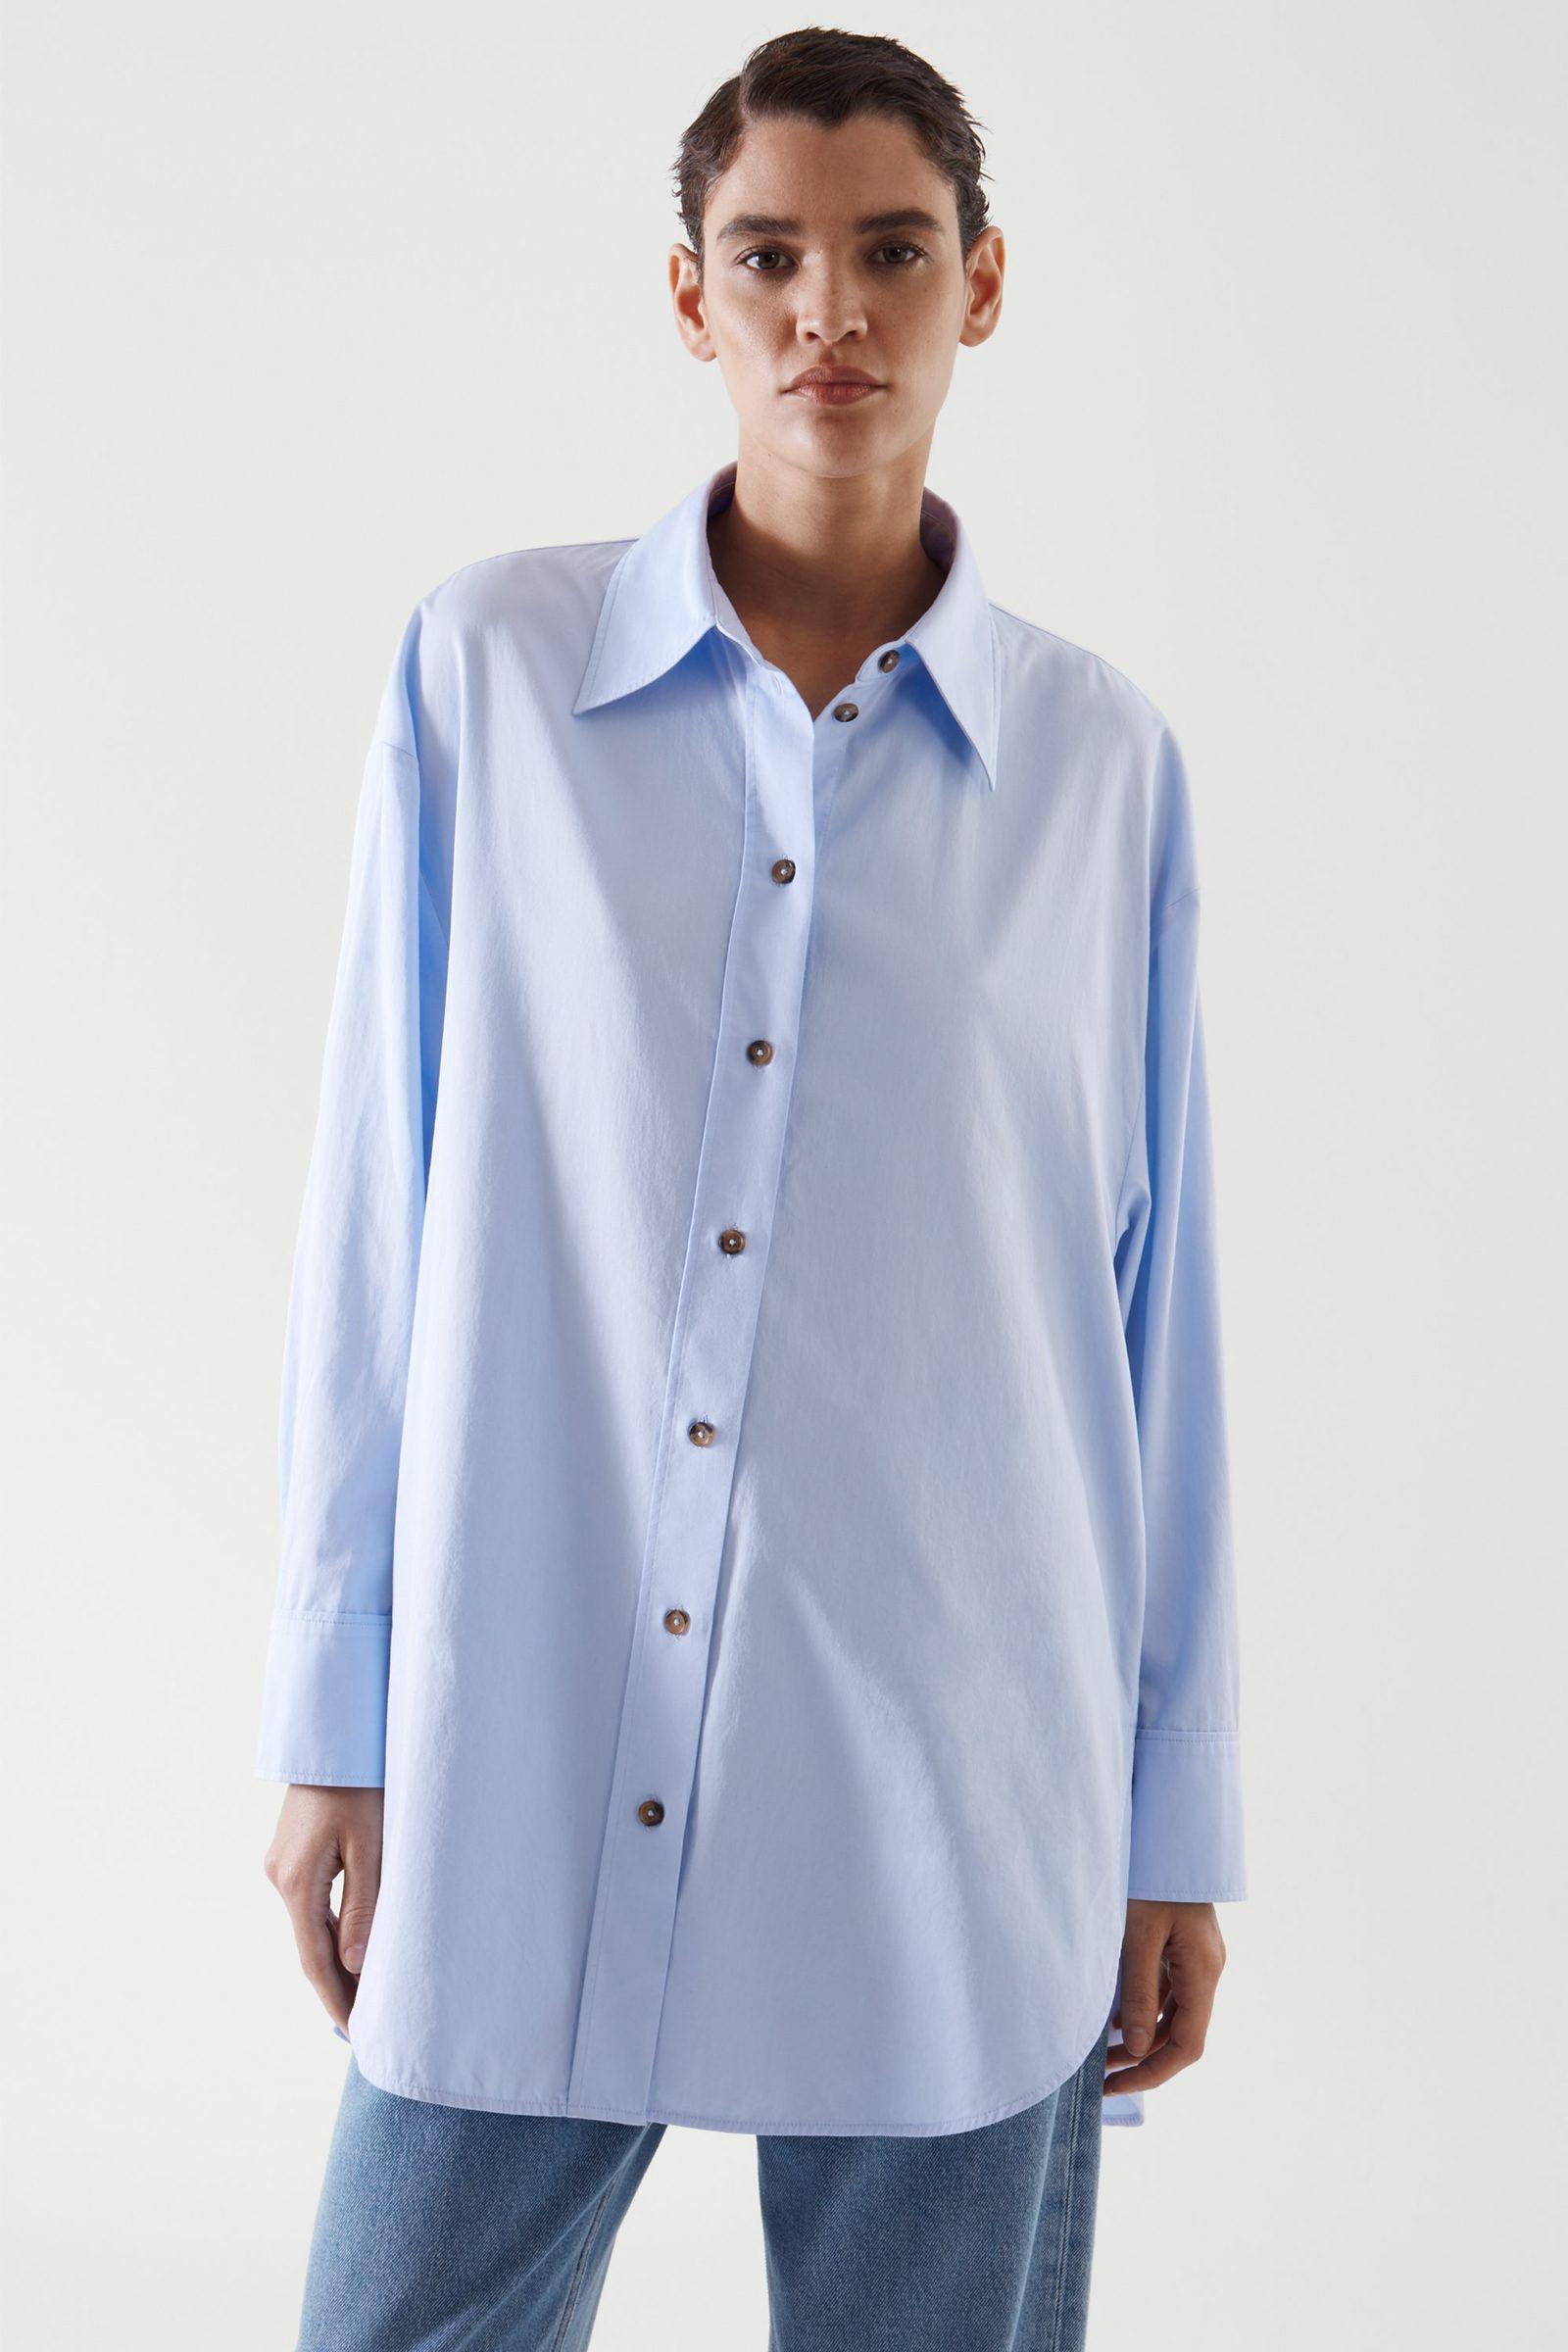 COS 오버사이즈 셔츠 의 라이트 블루컬러 ECOMLook입니다.